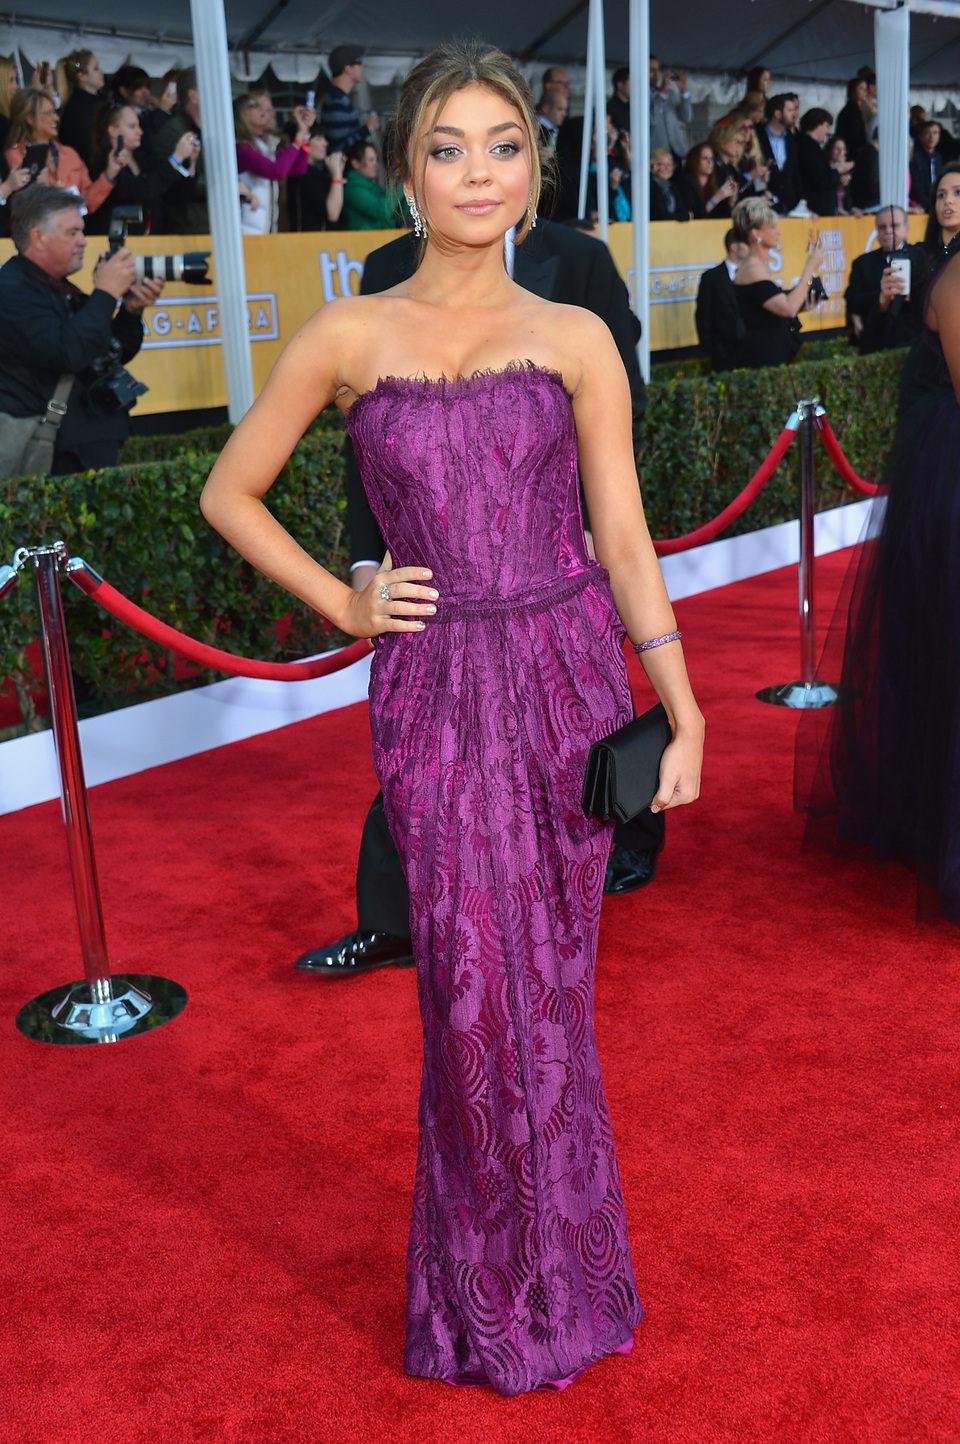 Sarah Hyland en la alfombra roja de los Screen Actors Guild Awards 2013